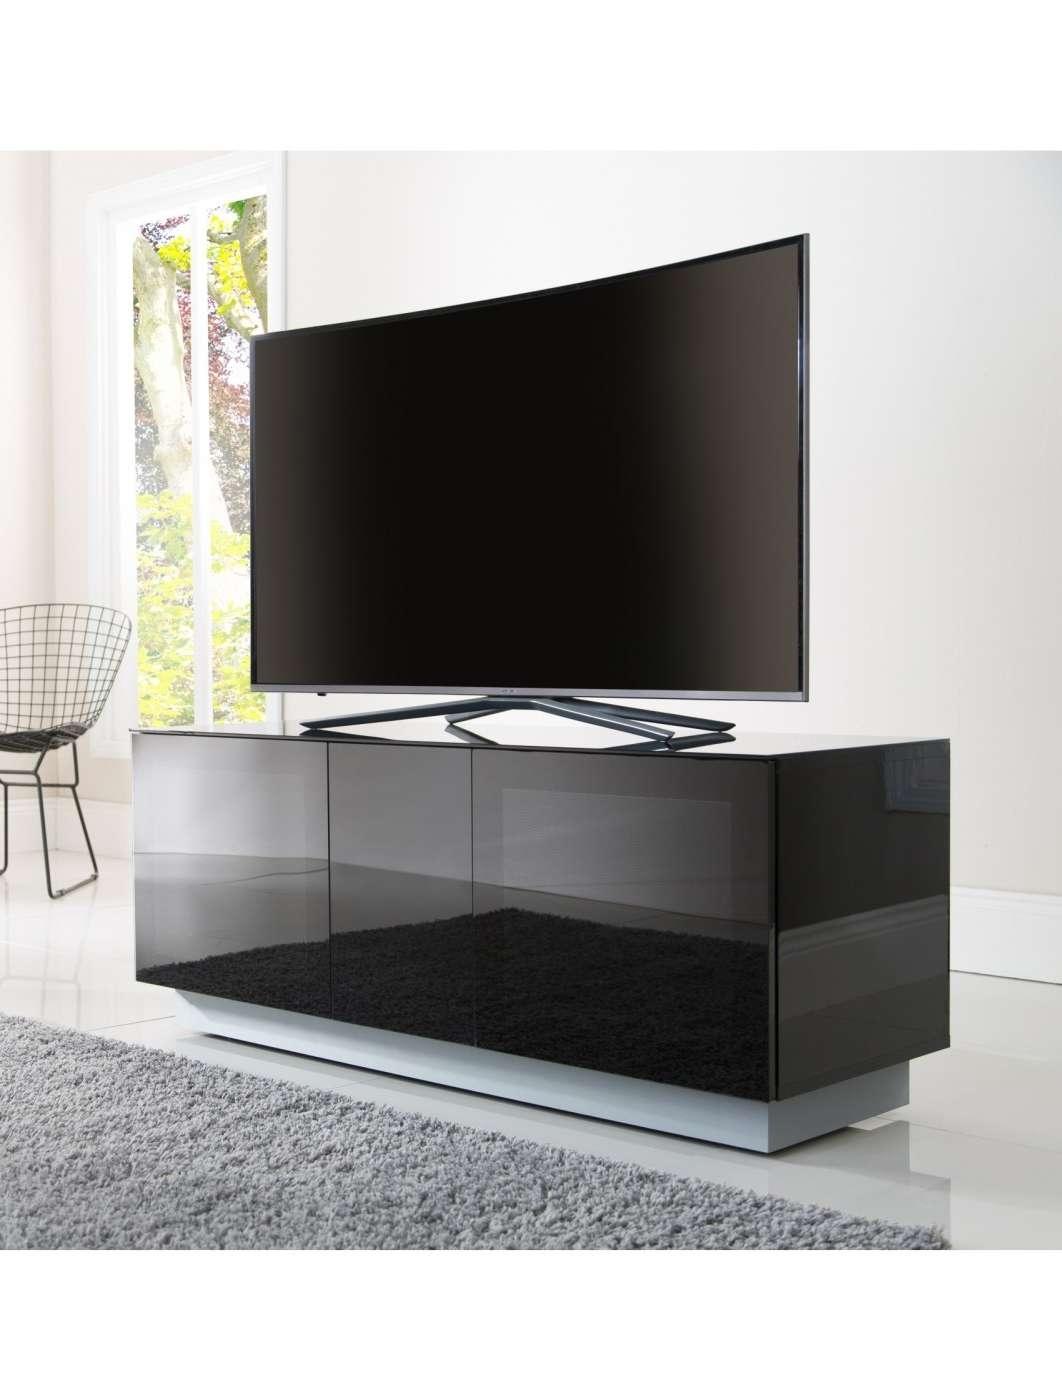 Alphason Emt1250Xl Blk Element Modular Tv Stand | 121 Tv Mounts Inside Alphason Tv Cabinets (View 12 of 20)